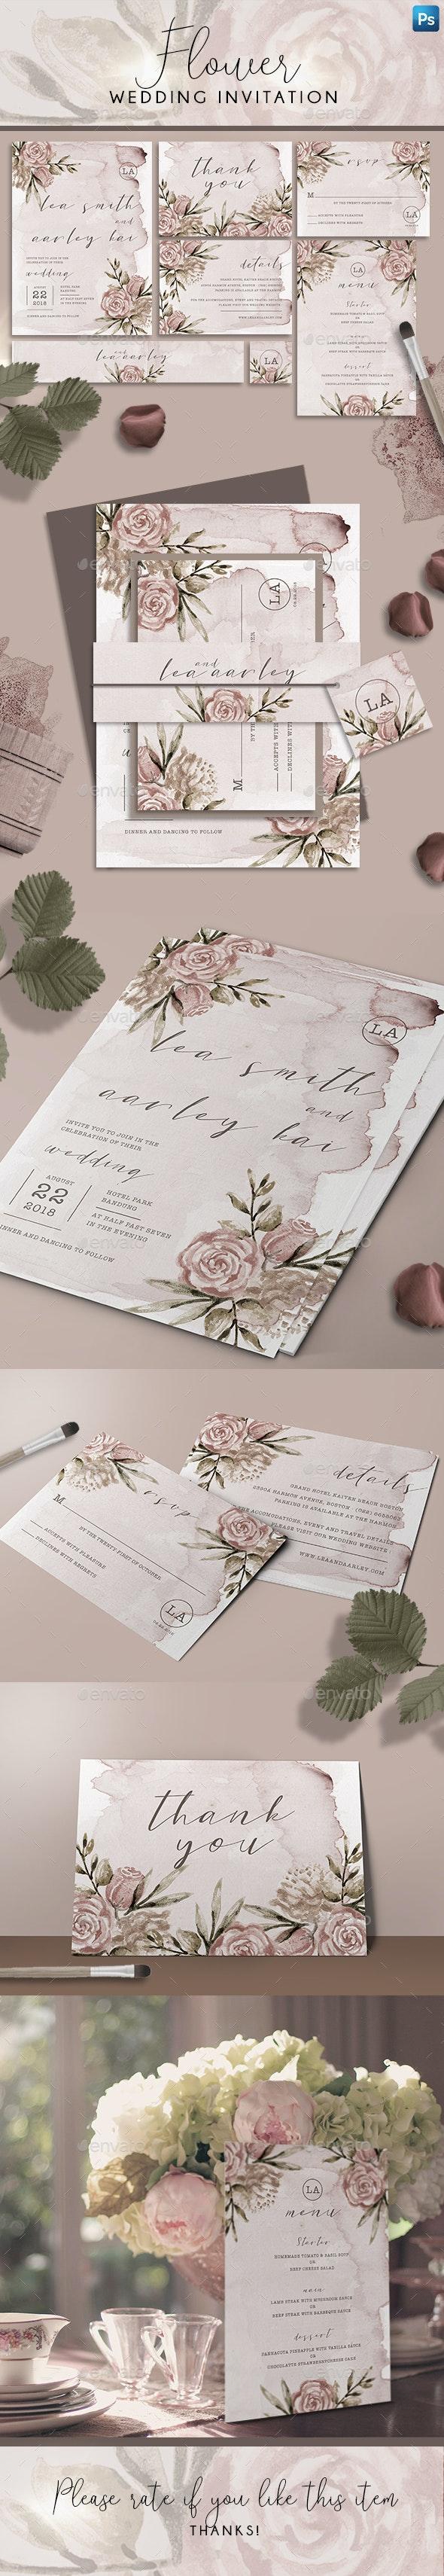 Flower Wedding Invitation - Weddings Cards & Invites